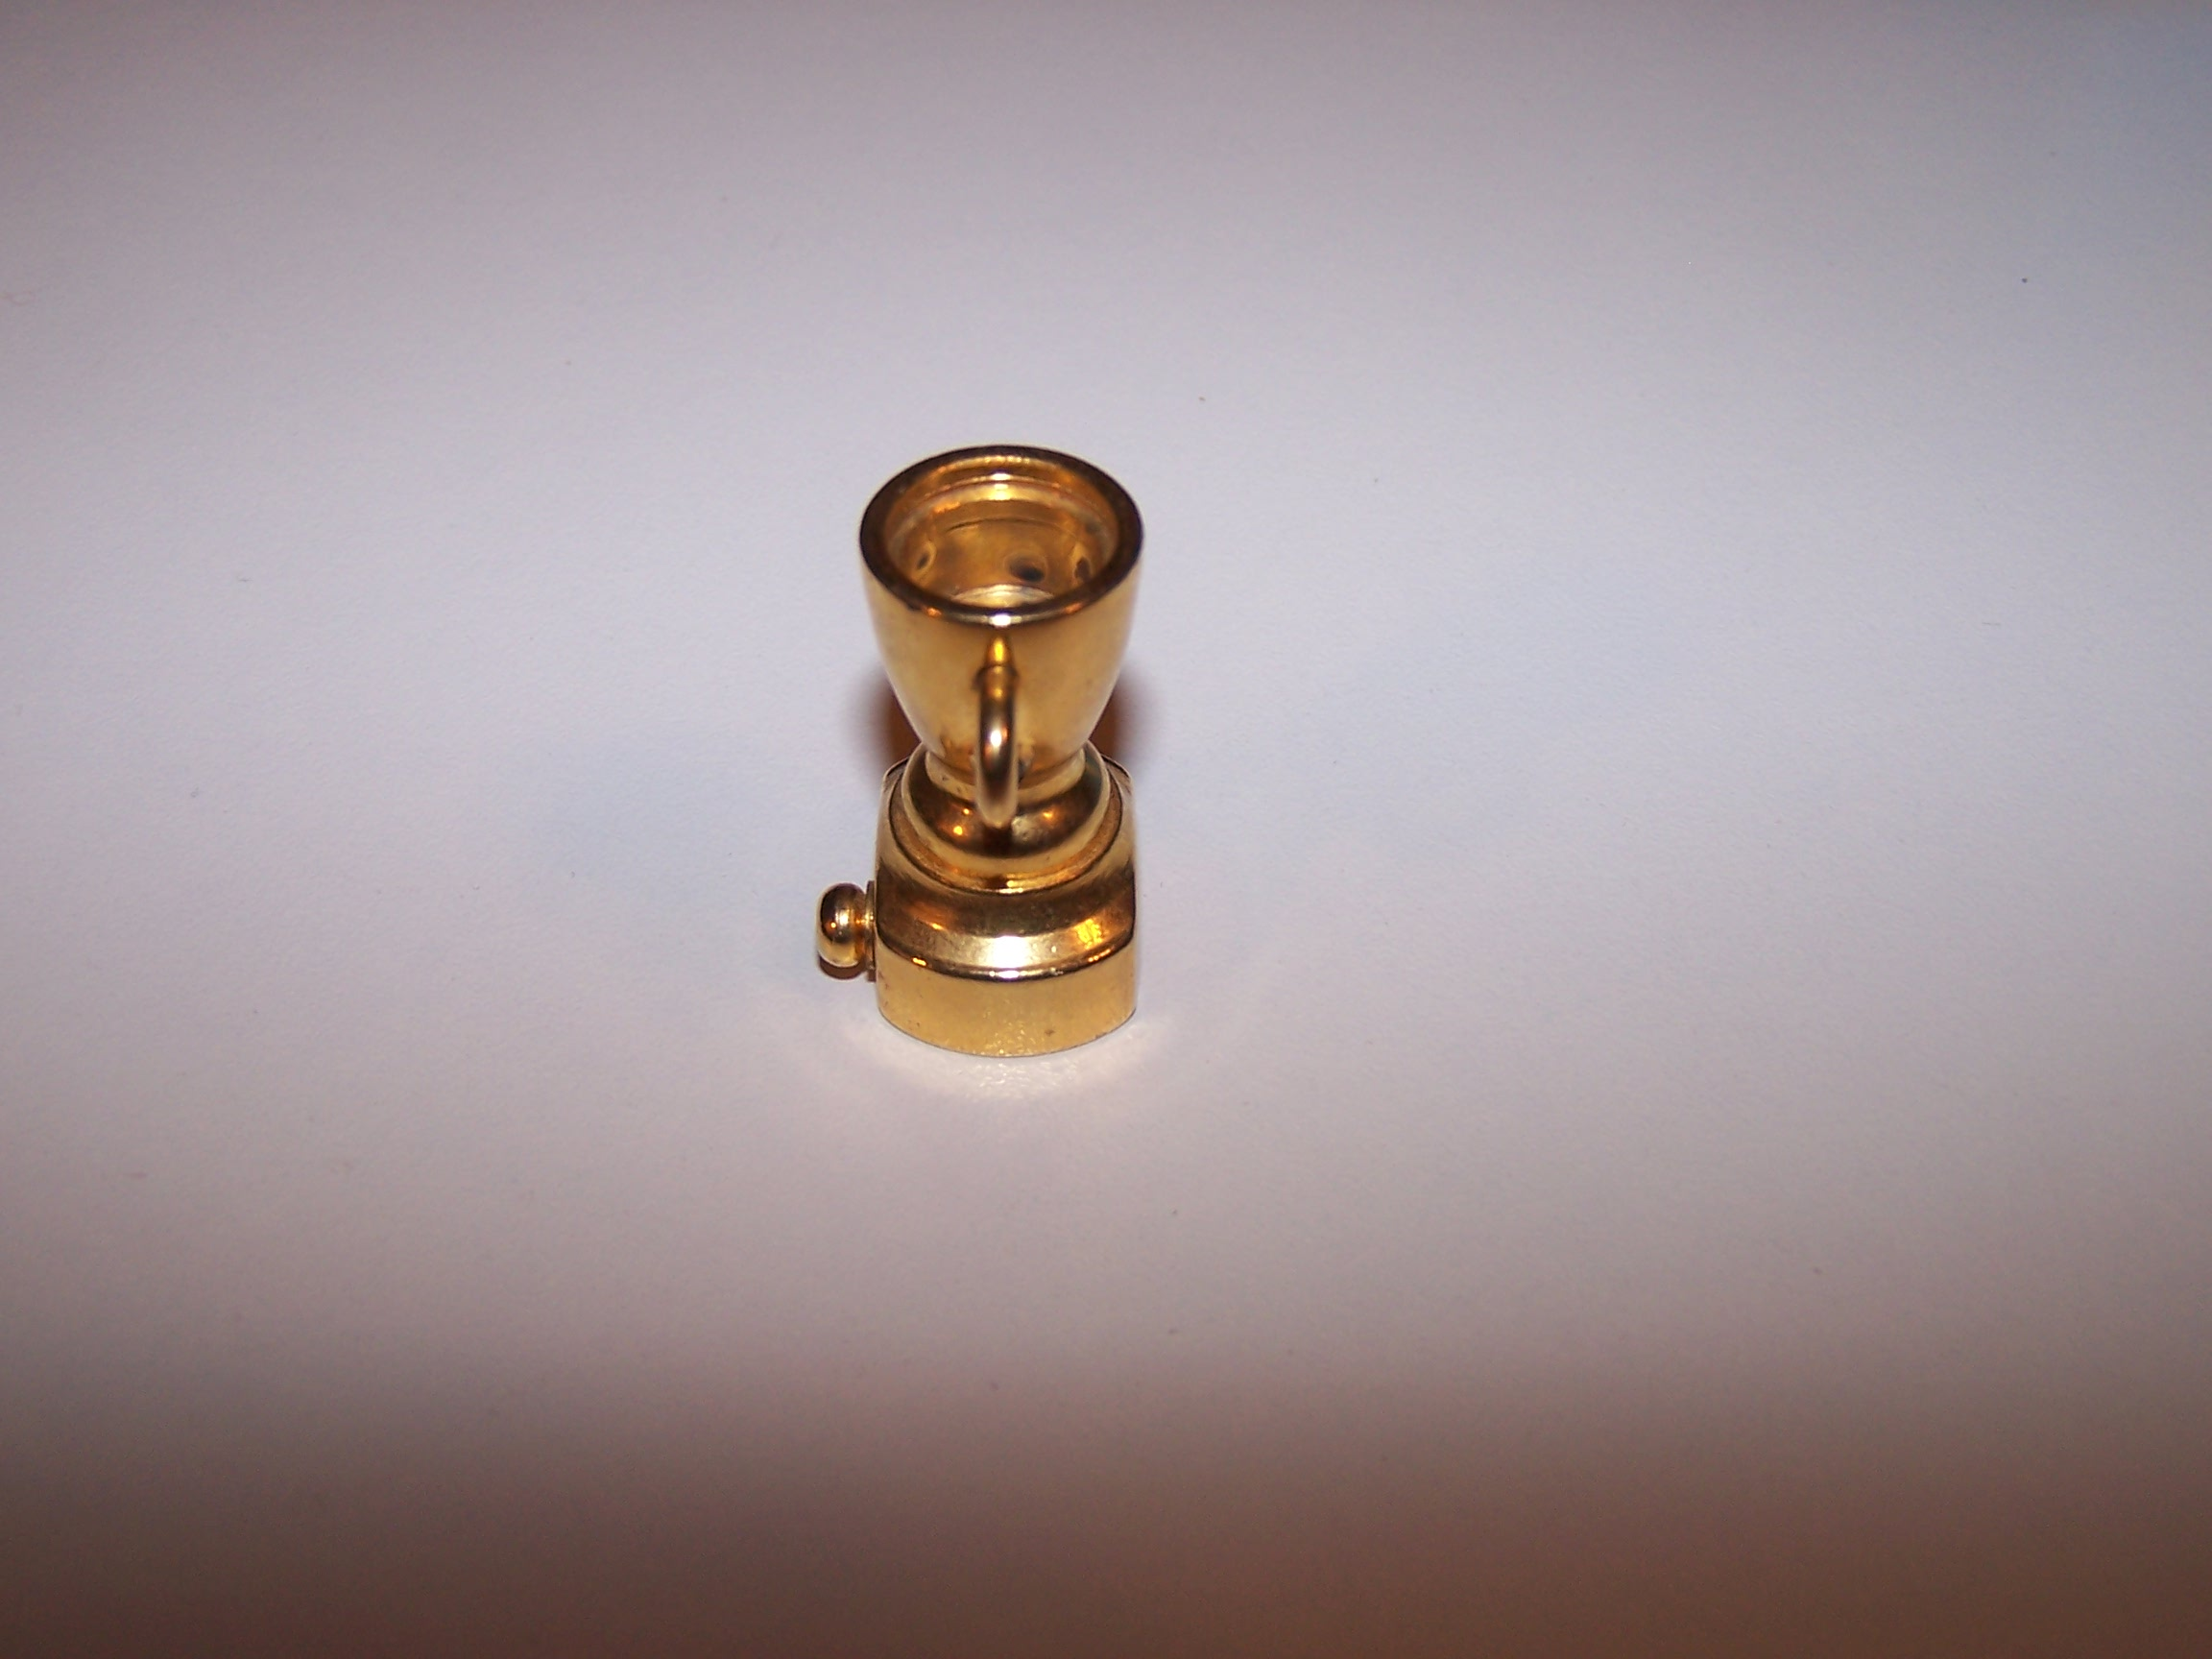 Image 2 of Dollhouse Brass Trophy, Miniature